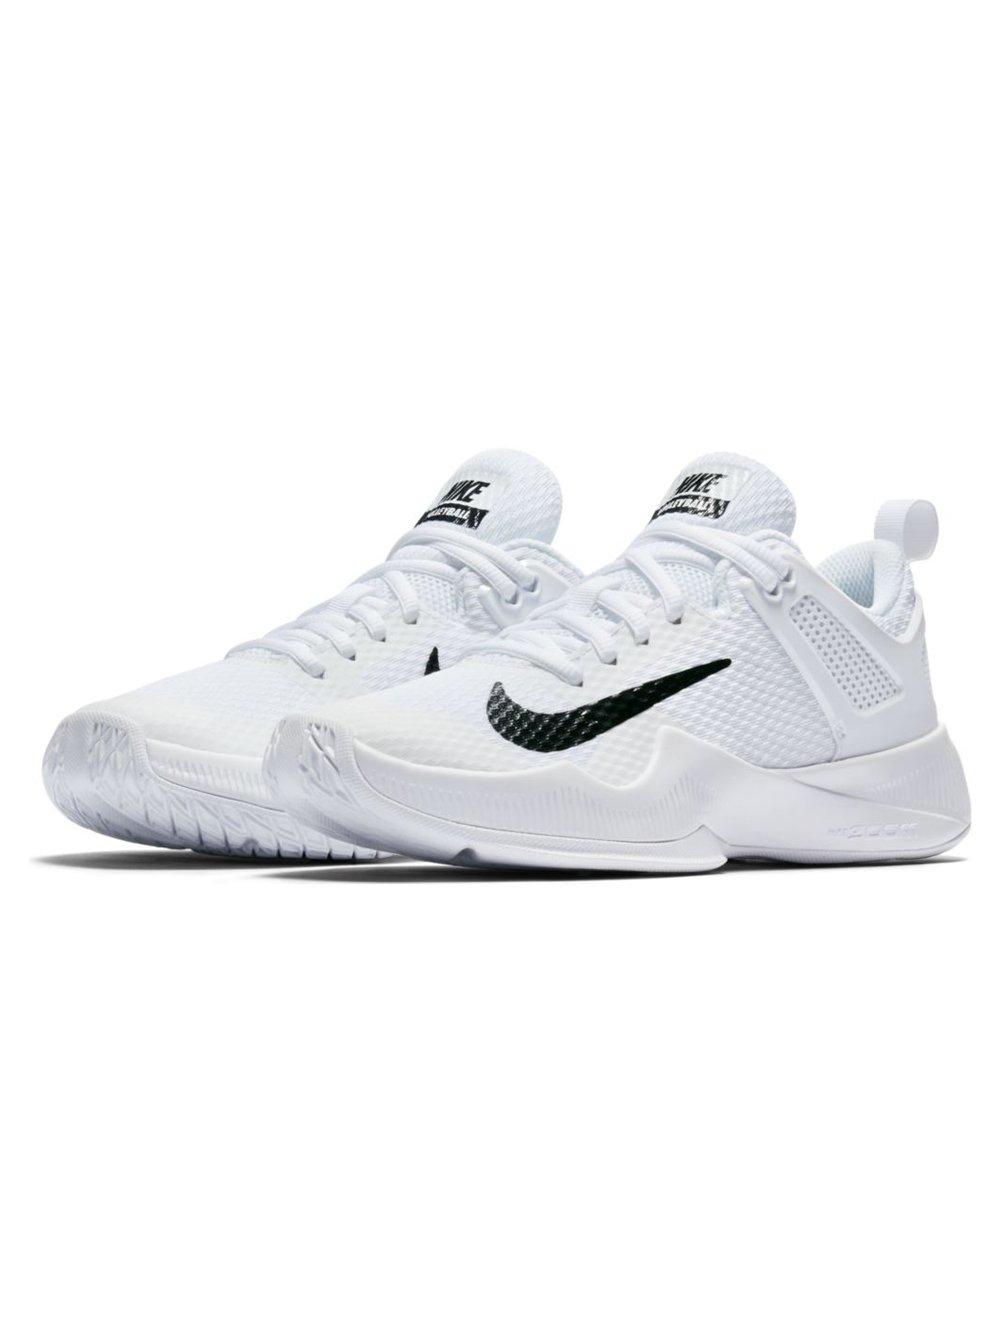 Nike Womens Wmns Air Zoom Hyperace, White / Black, 10.5 M US